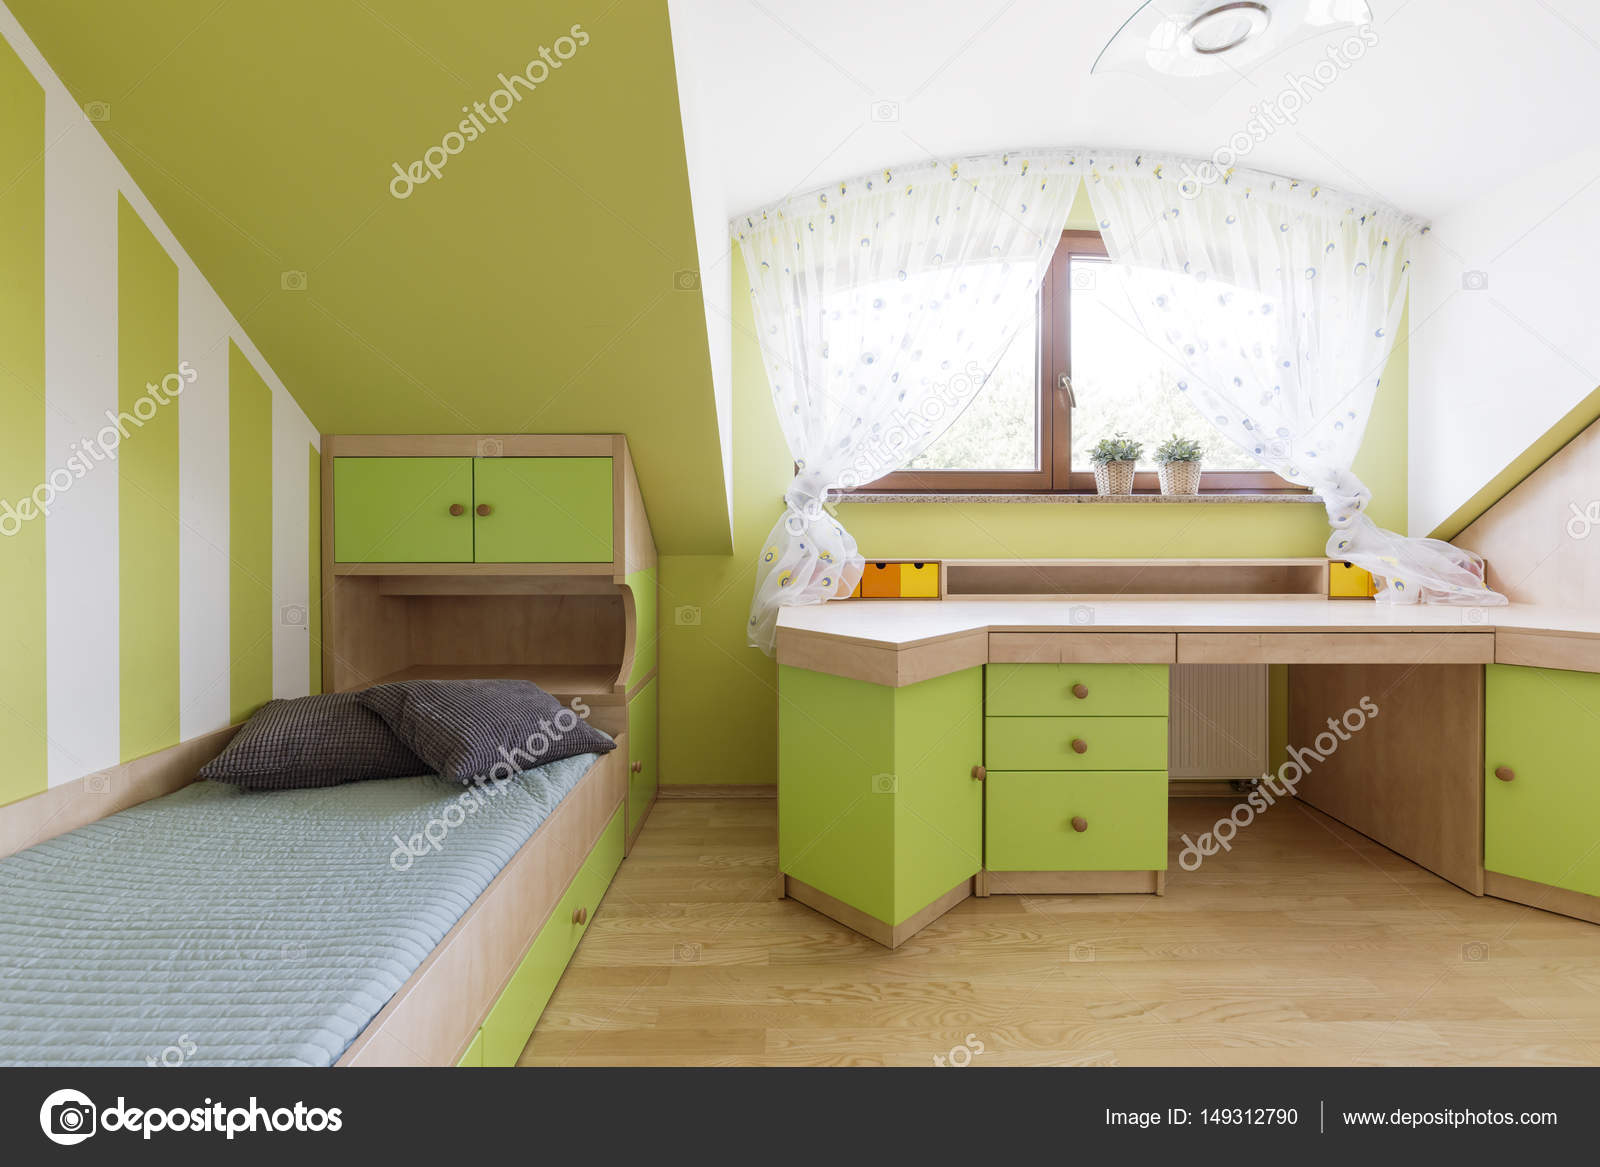 Unisex Kinderzimmer In Grün U2014 Stockfoto